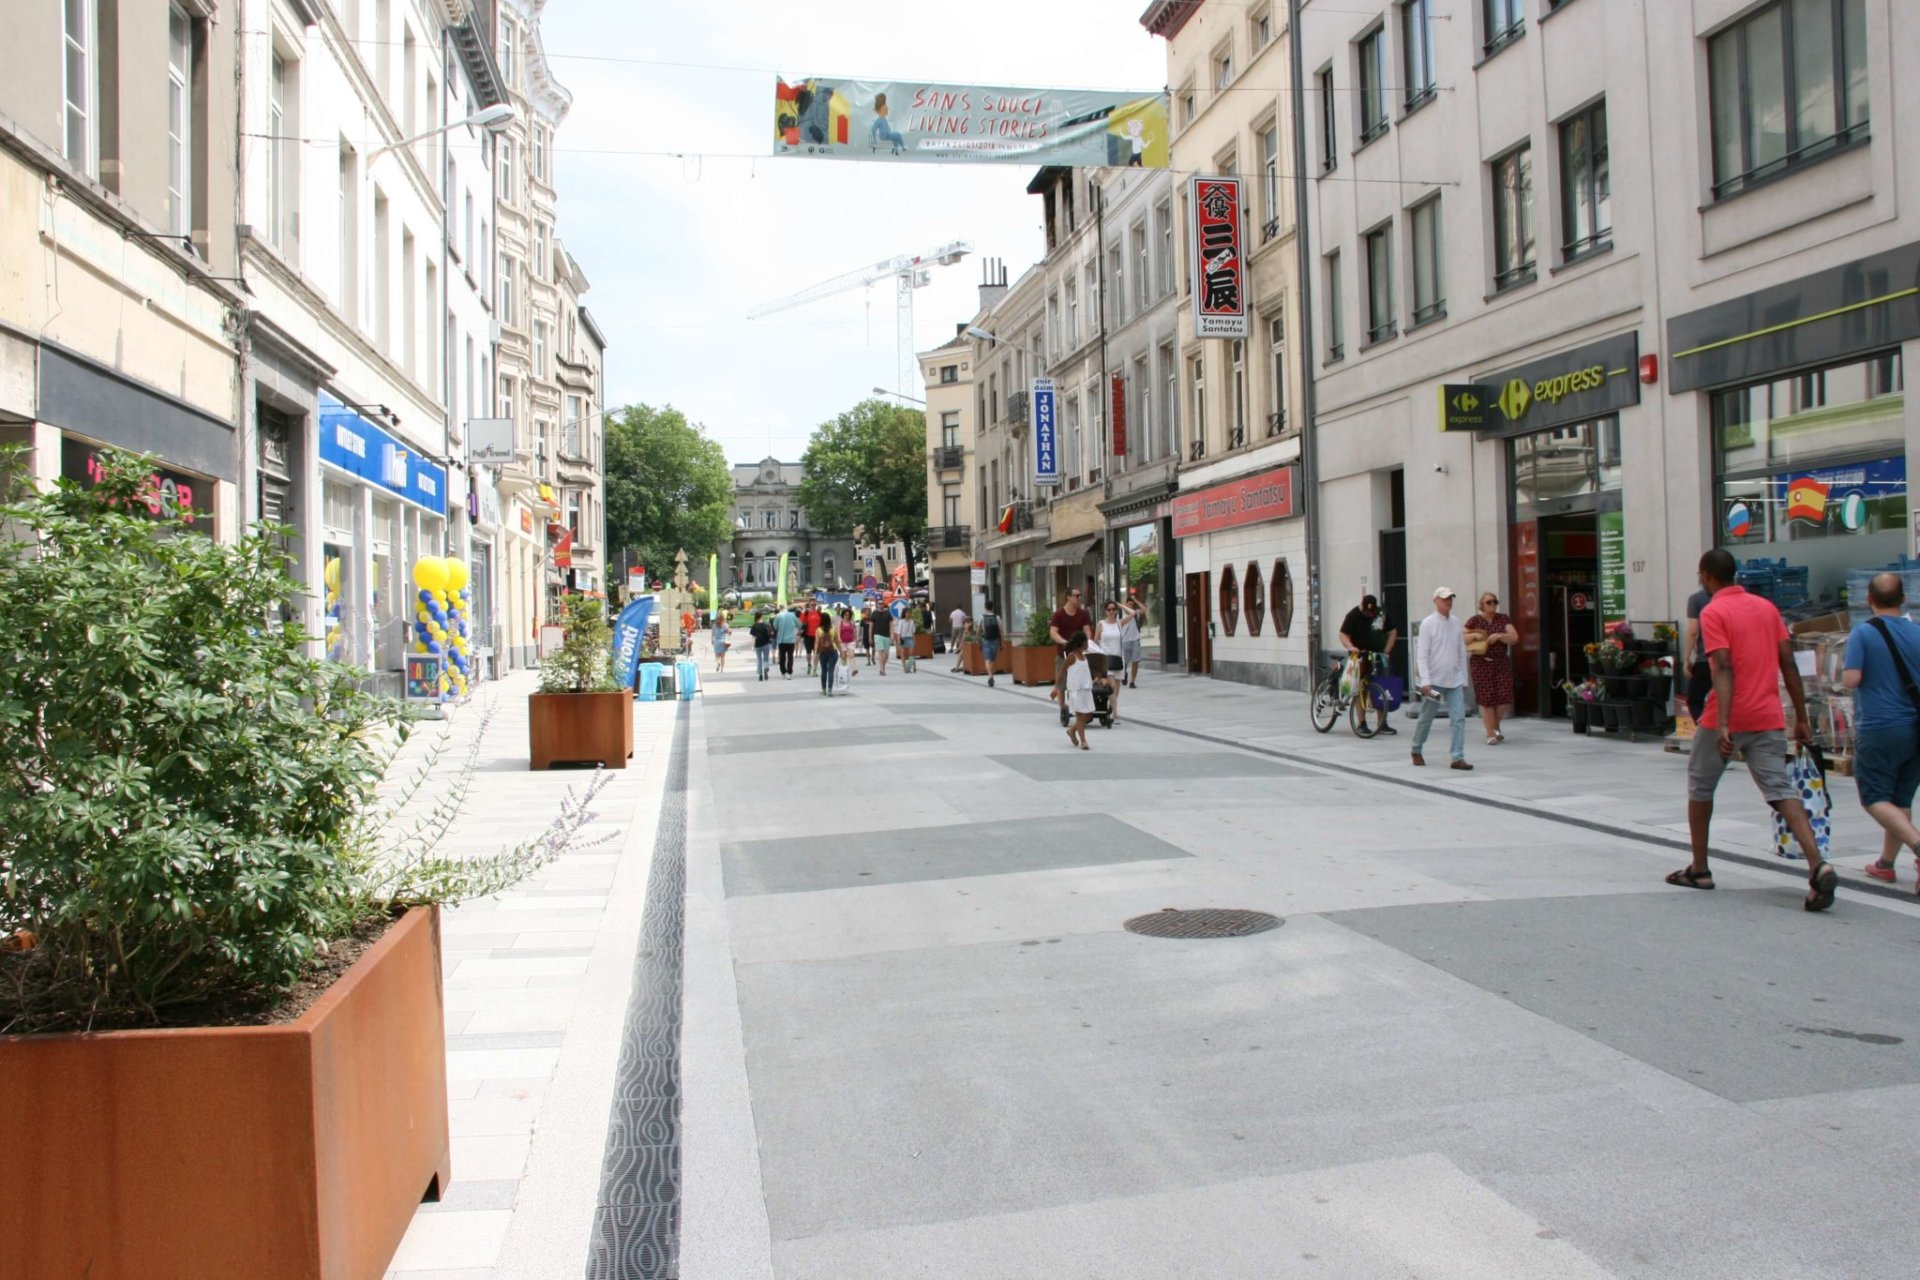 Chaussée d'Ixelles 42